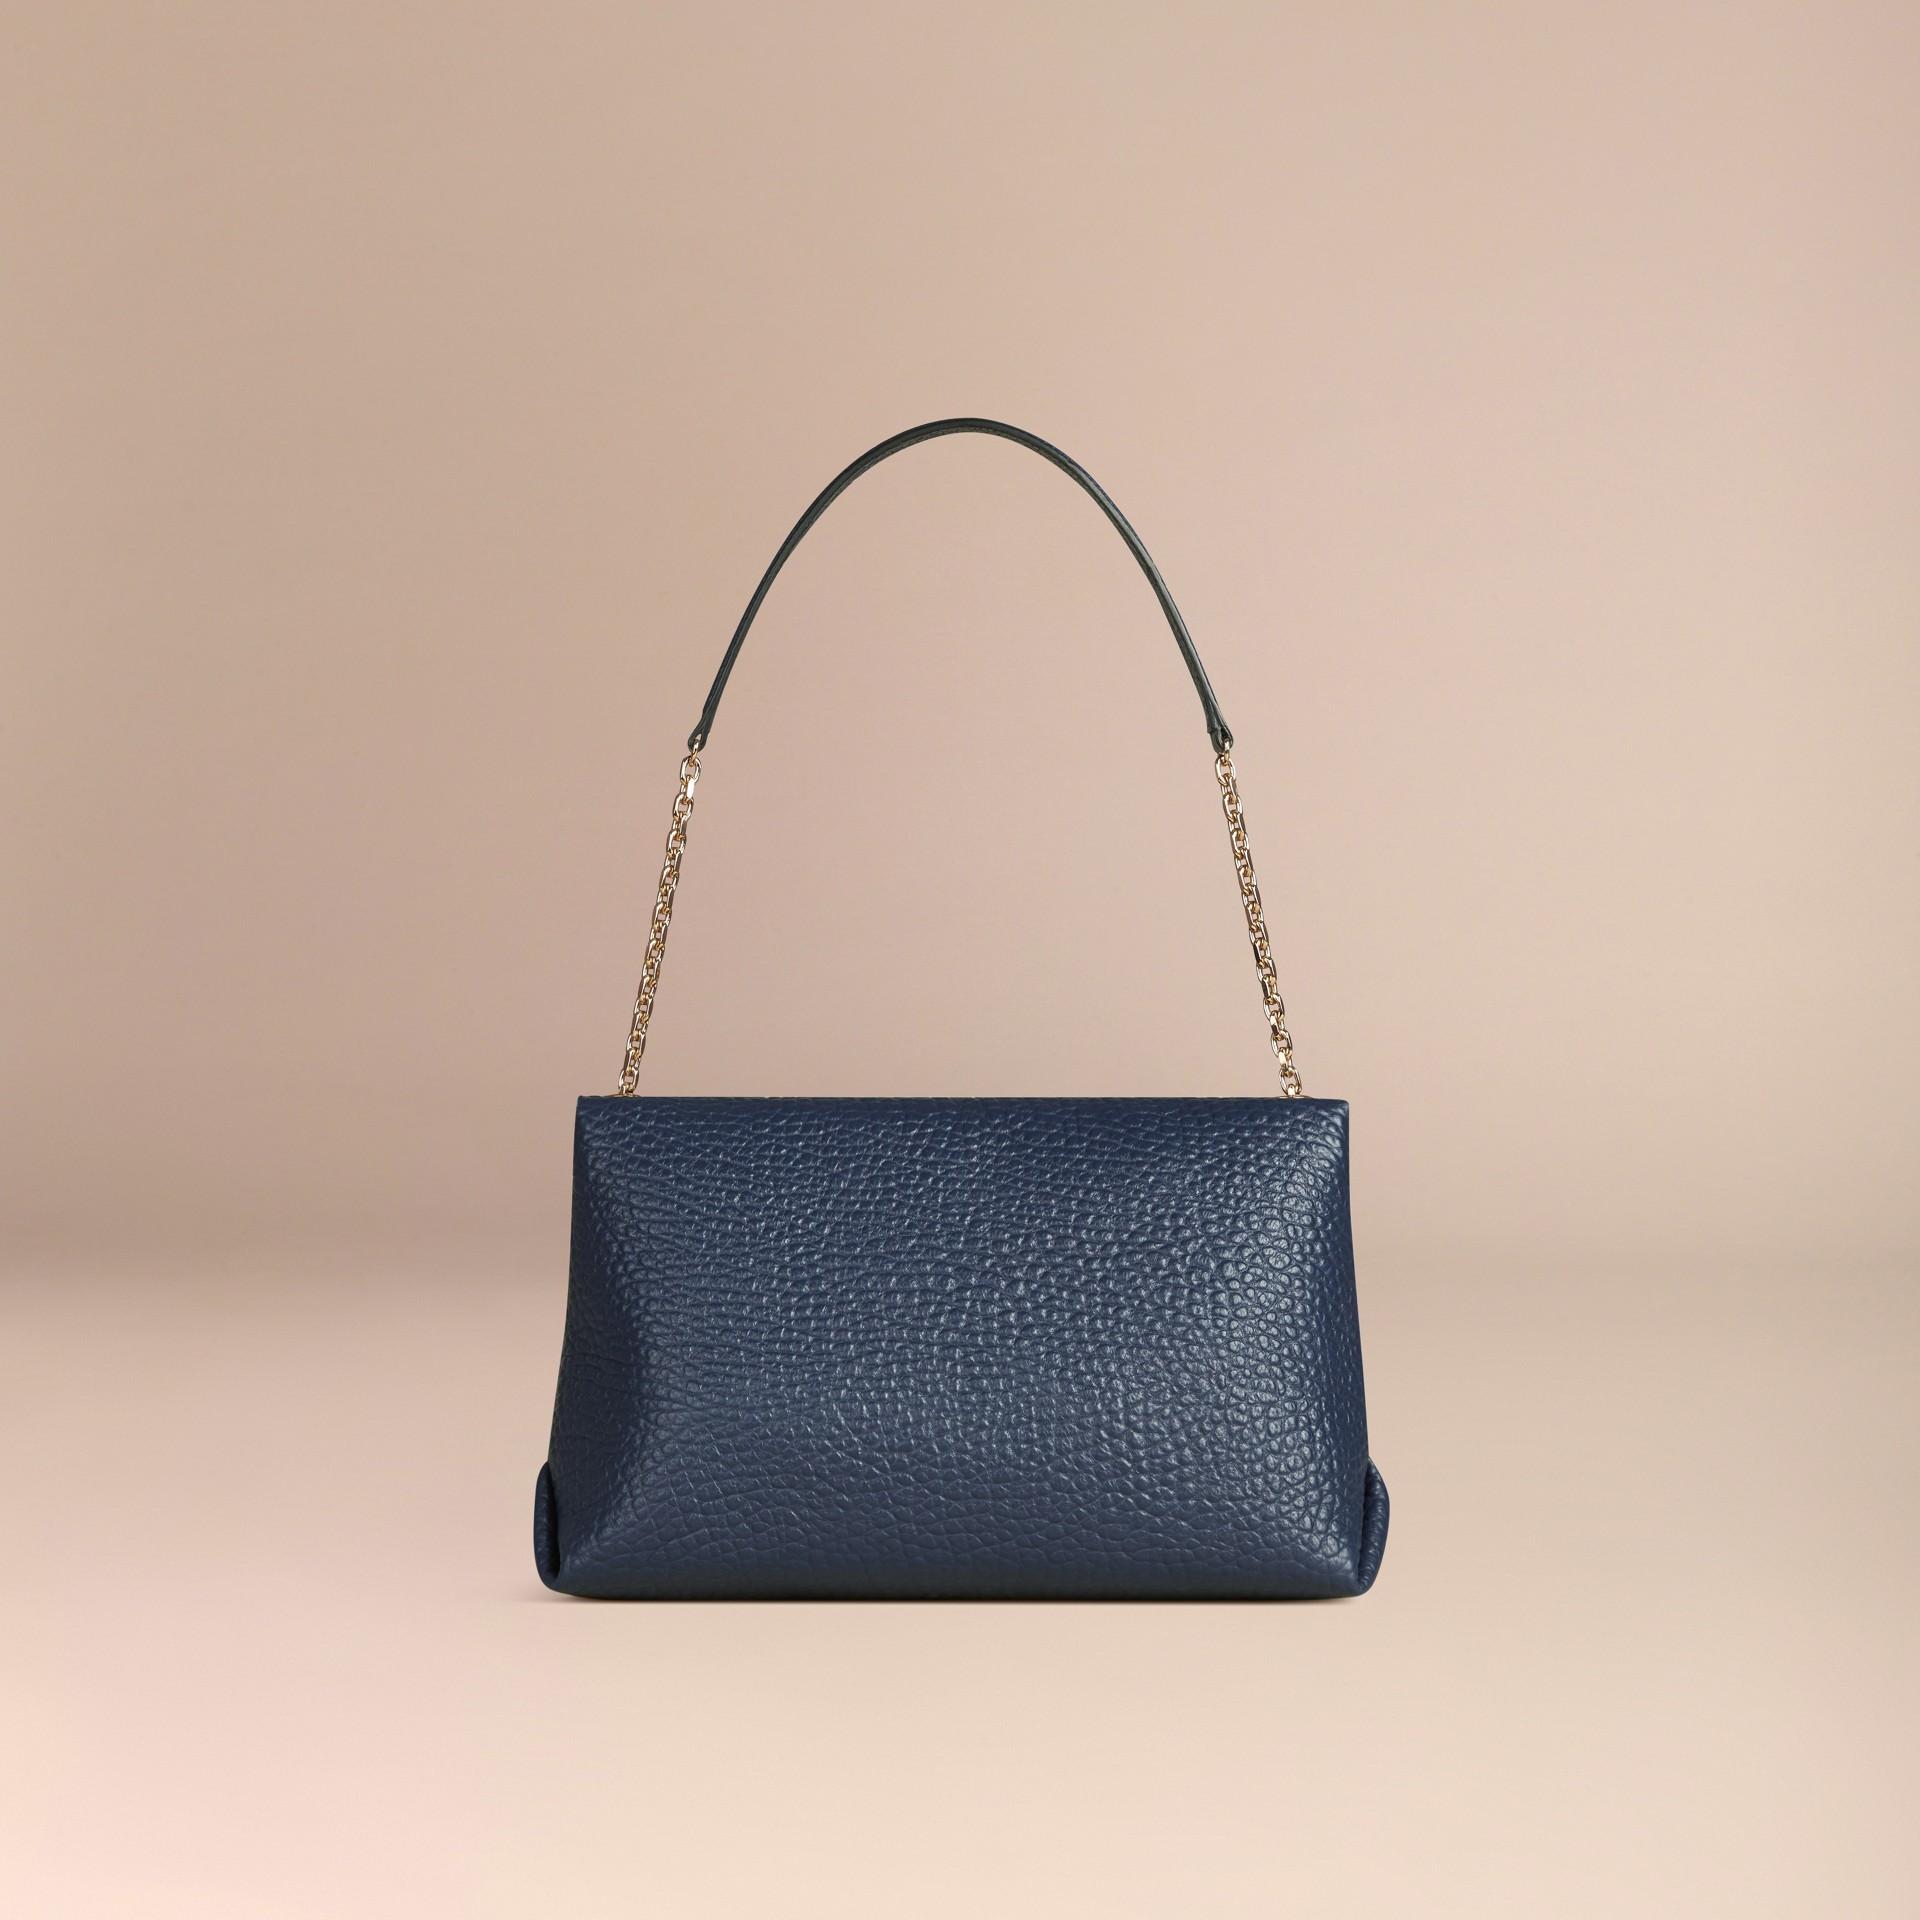 Carbonblau Große Schultertasche aus genarbtem Burberry-Leder Carbonblau - Galerie-Bild 4